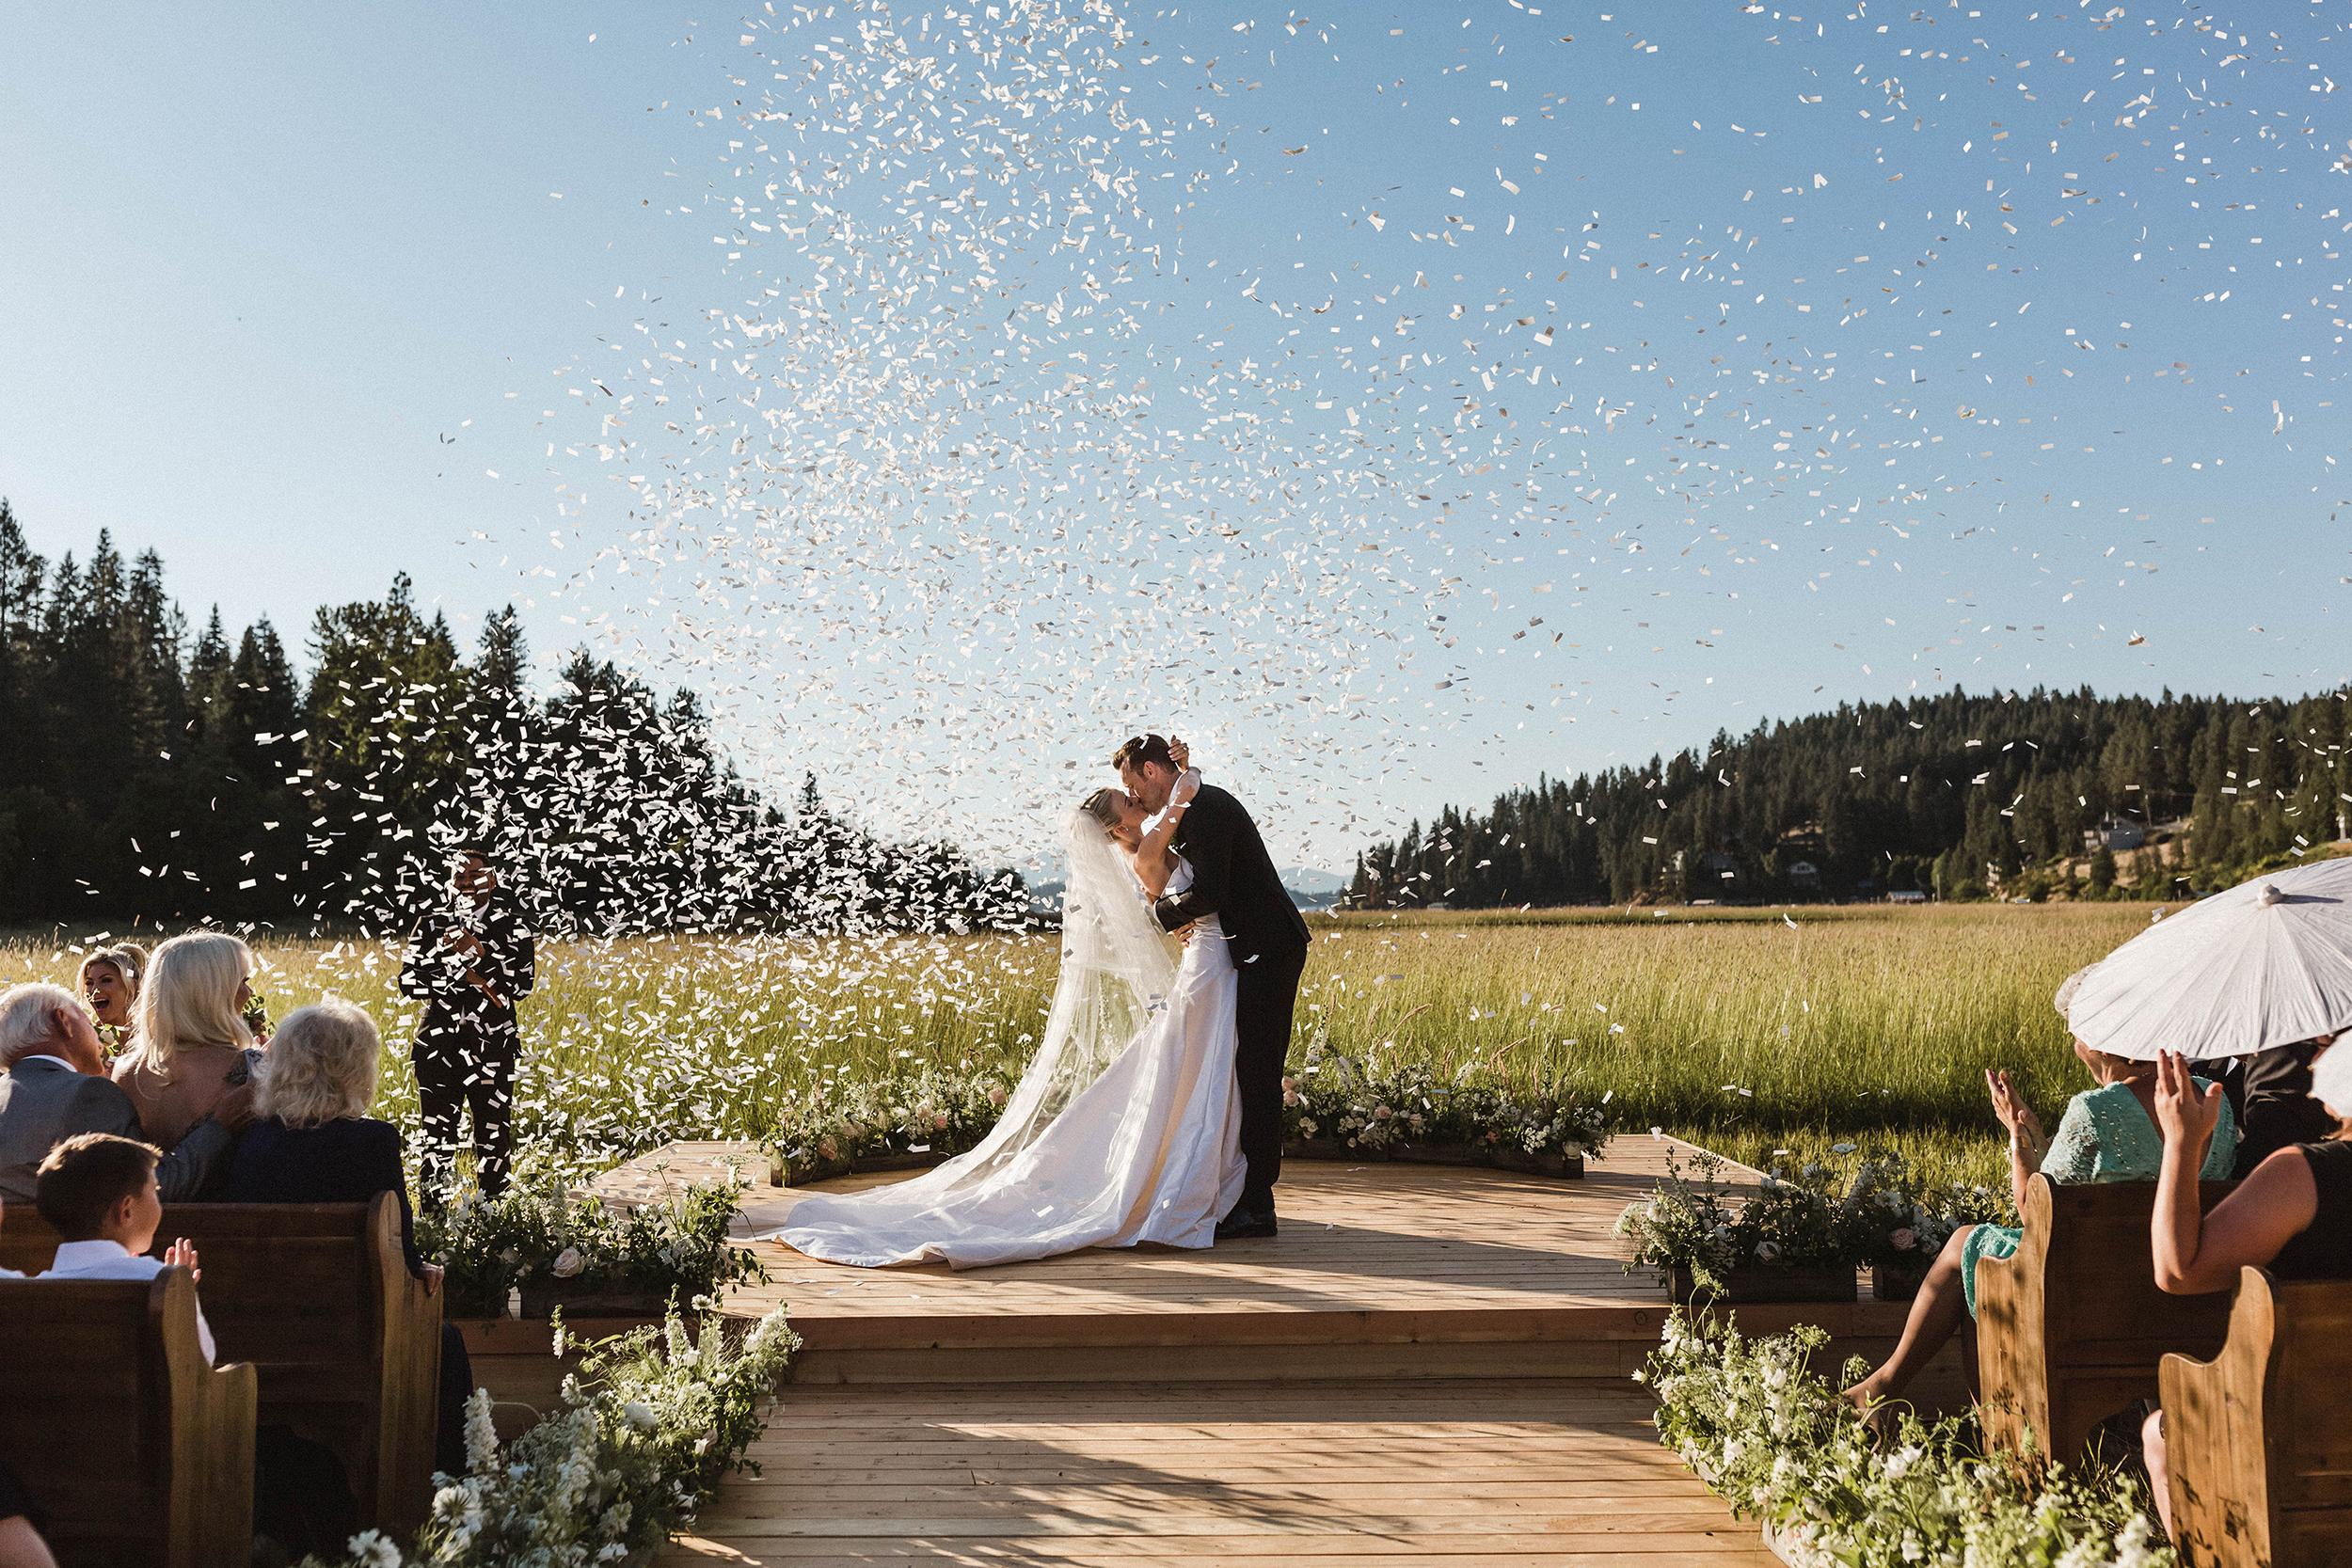 julianne hough and brooks laich wedding